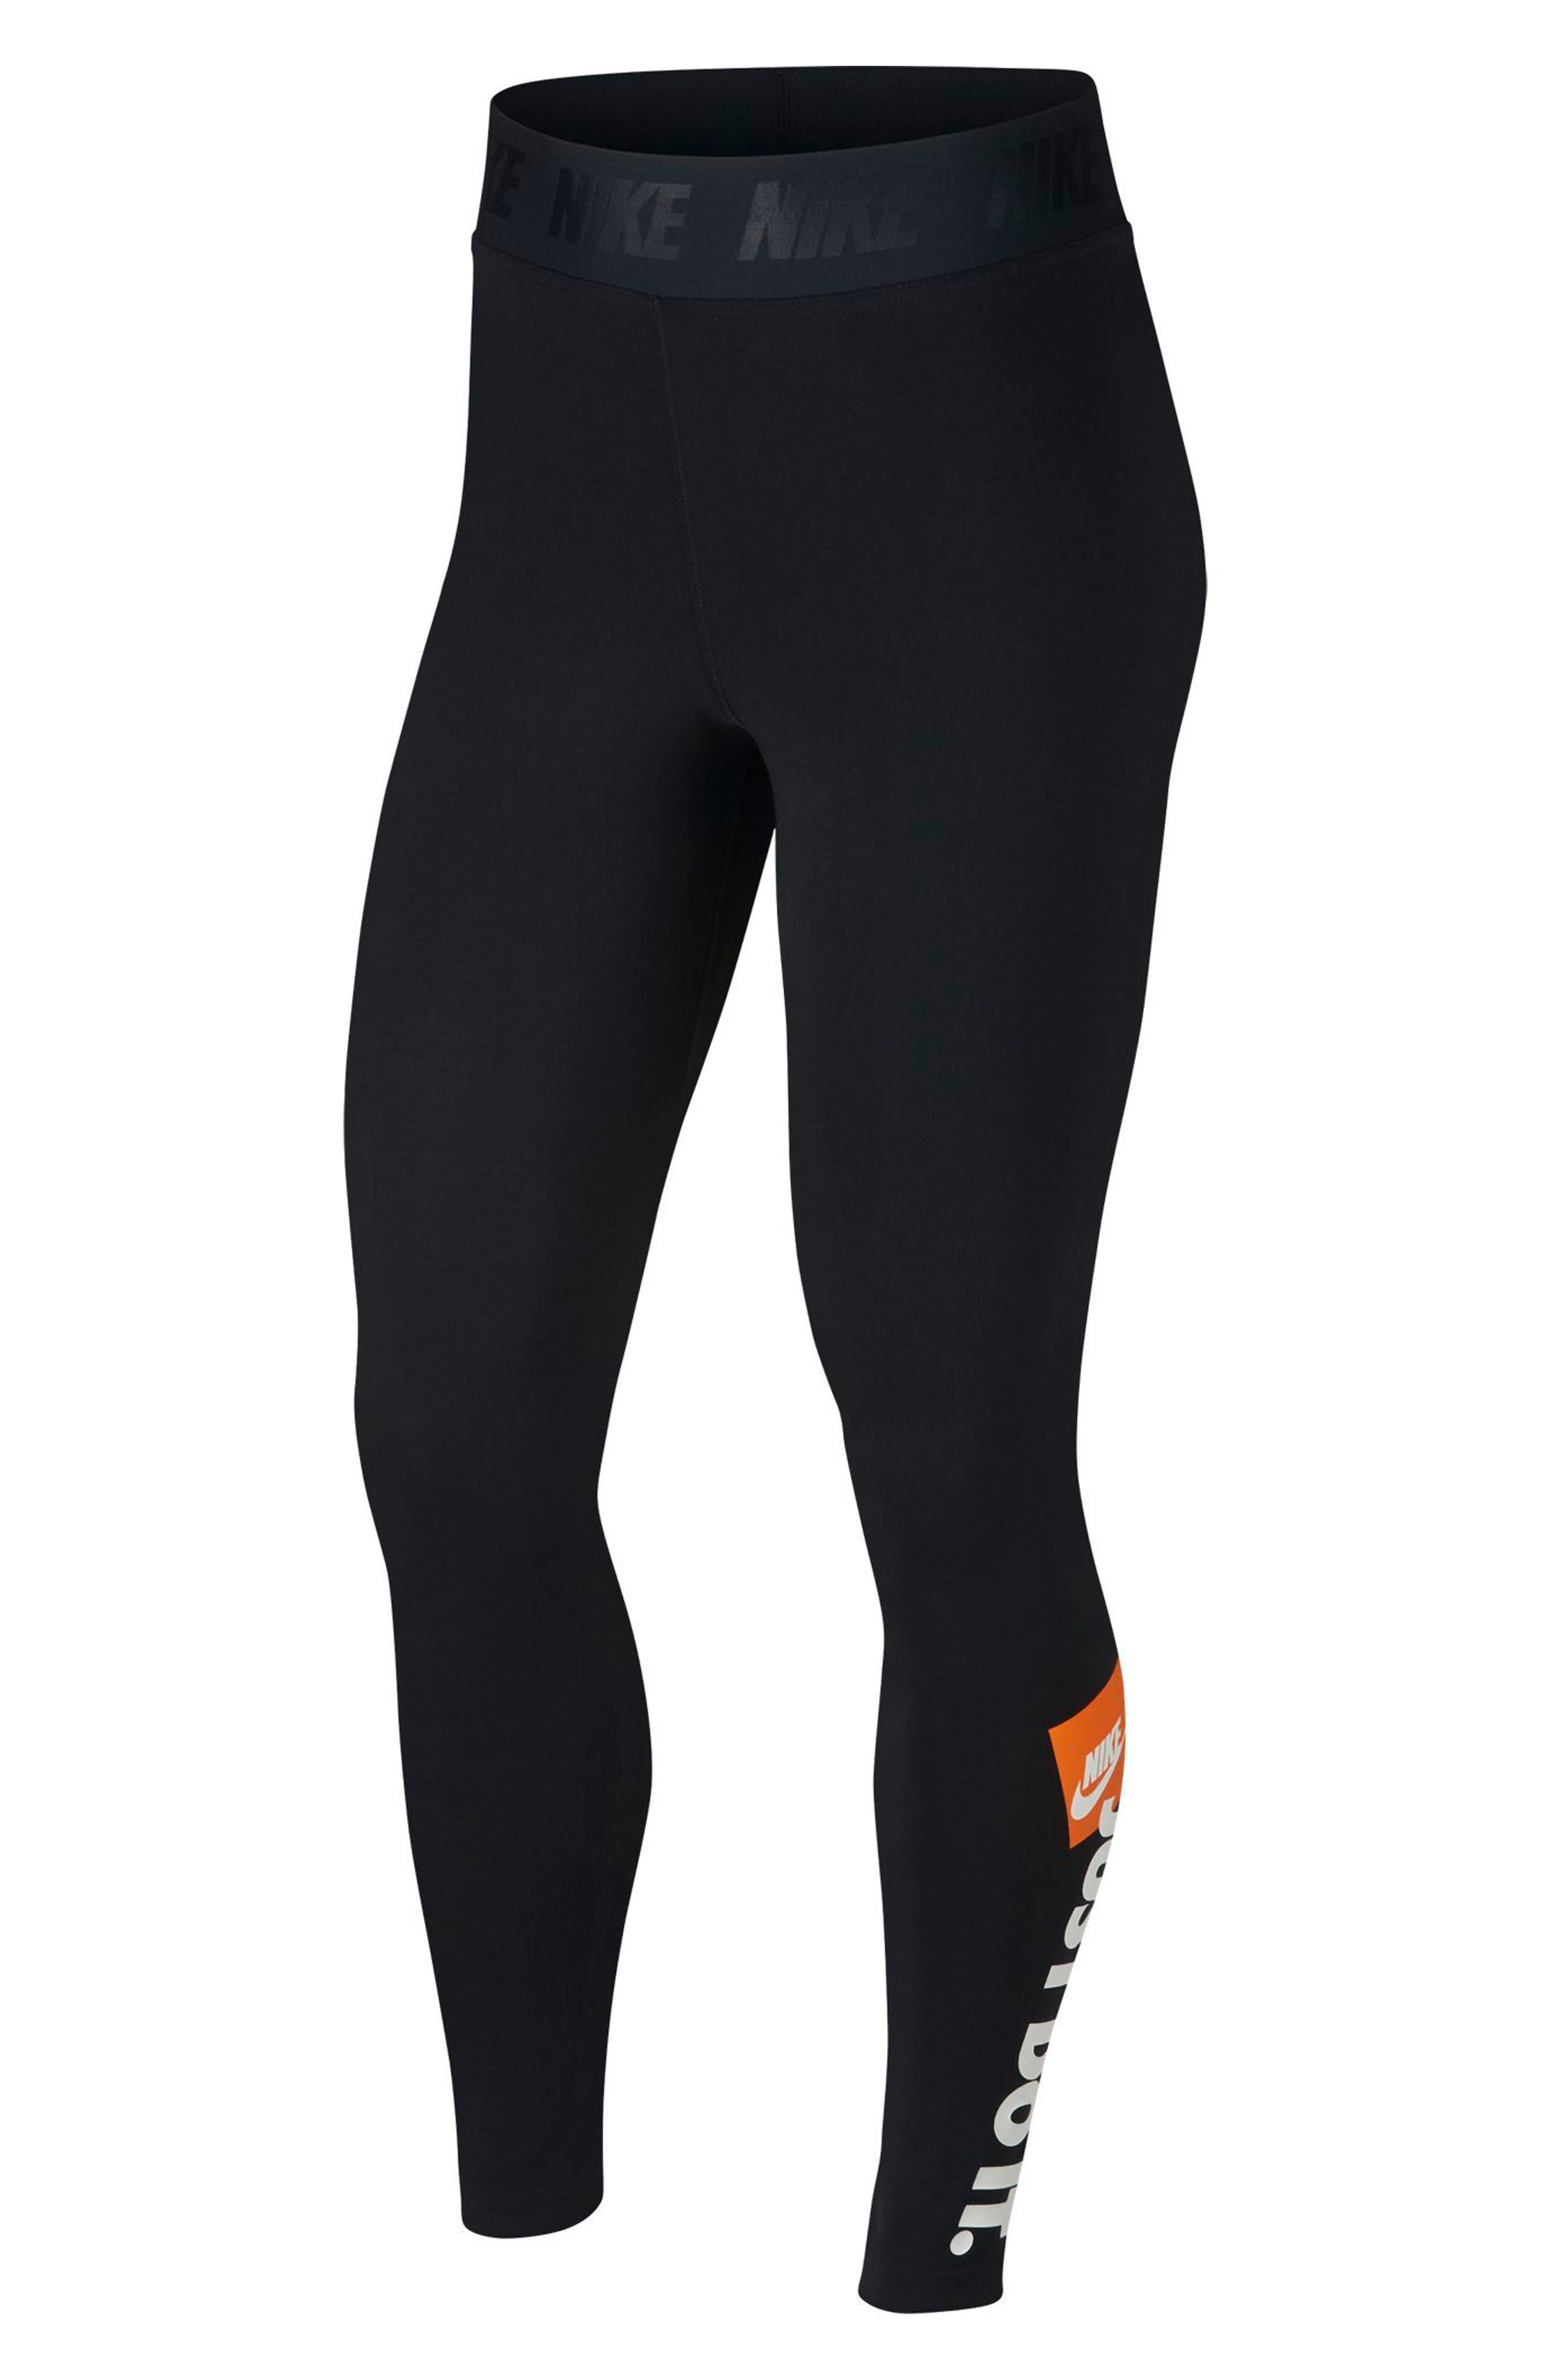 Sportswear Just Do It High Rise Women's Leggings,                             Main thumbnail 1, color,                             BLACK